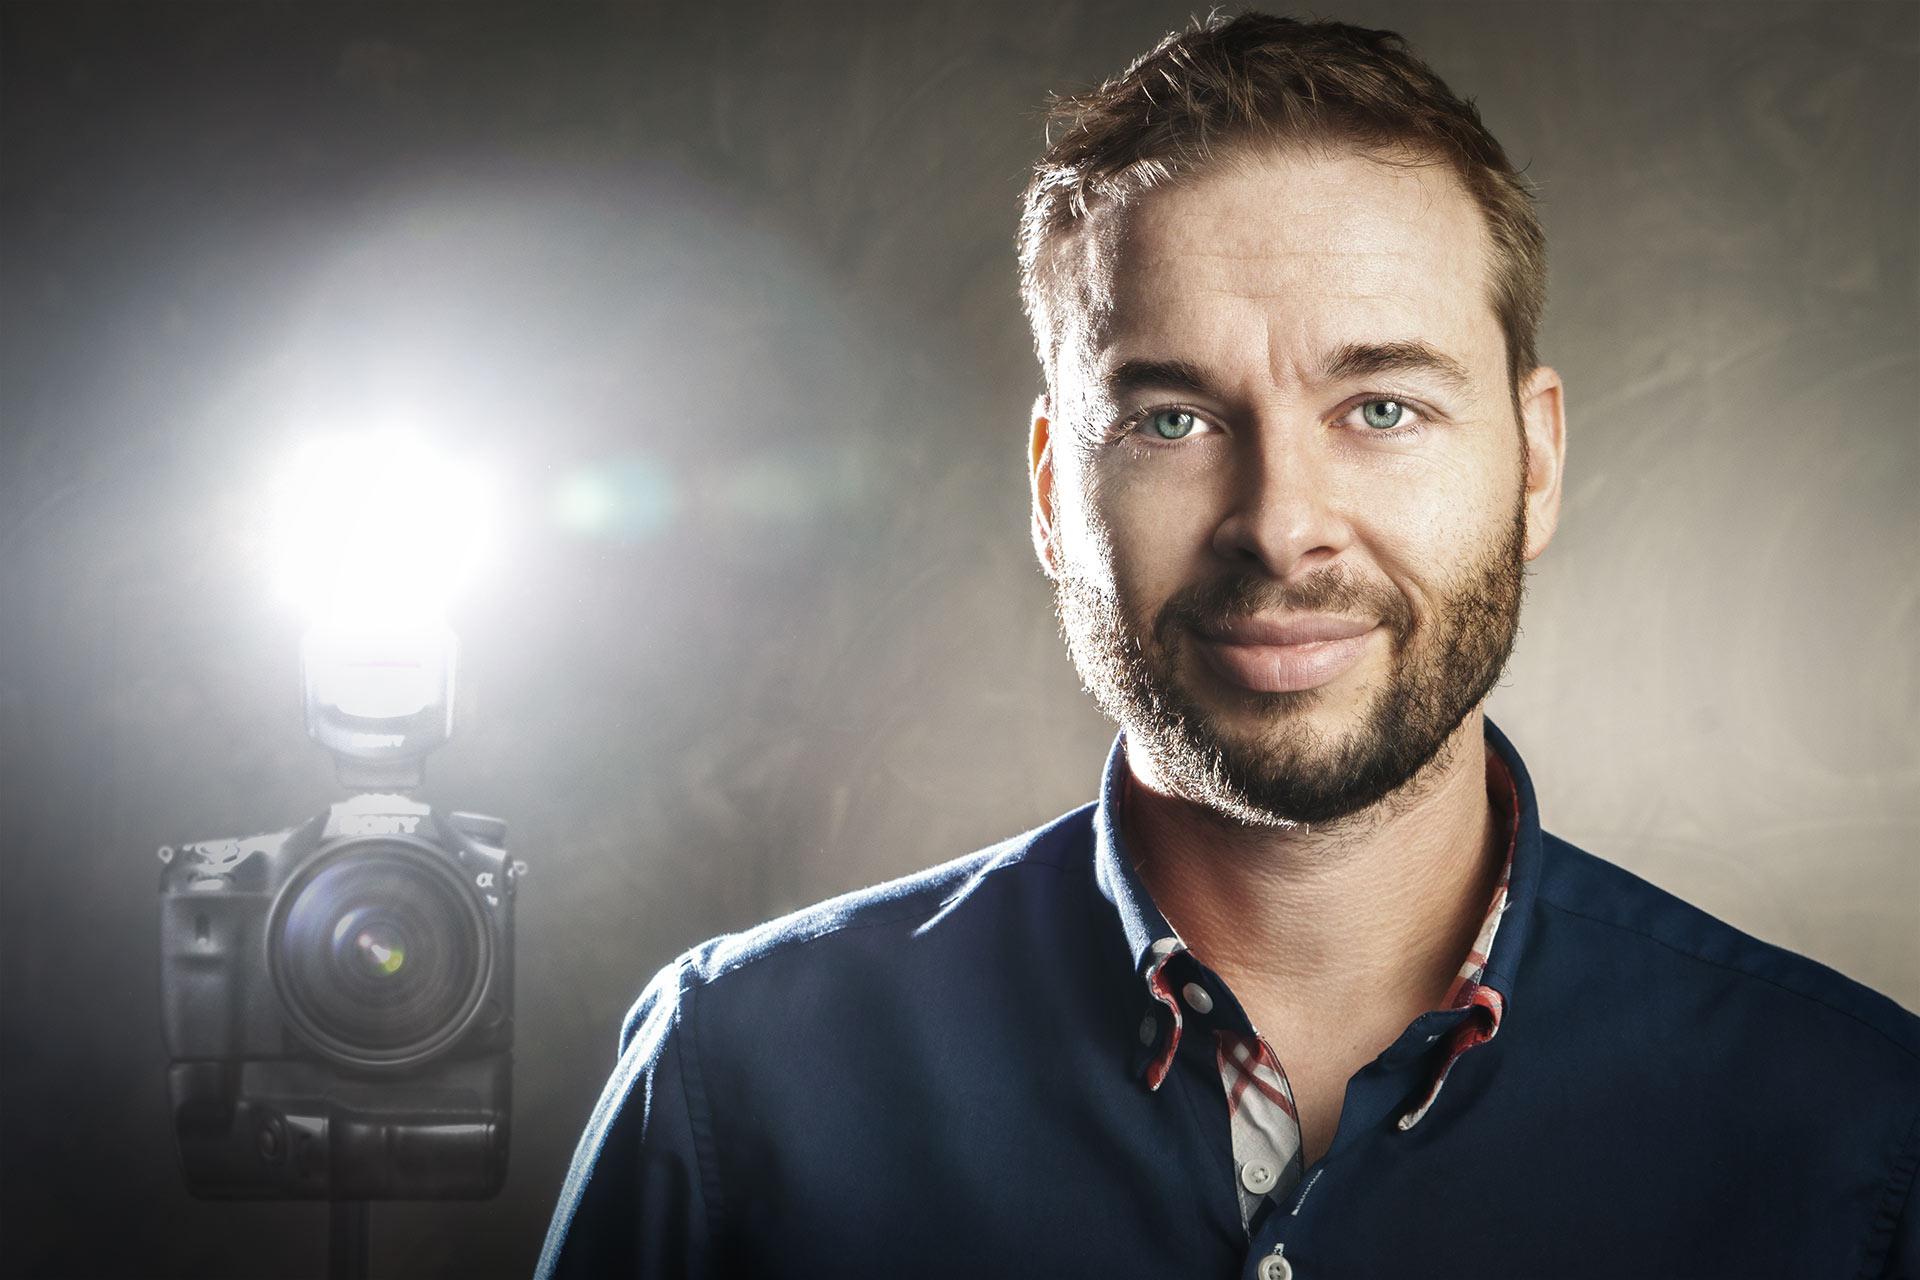 Fotograf in Dorsten, Marc Frey